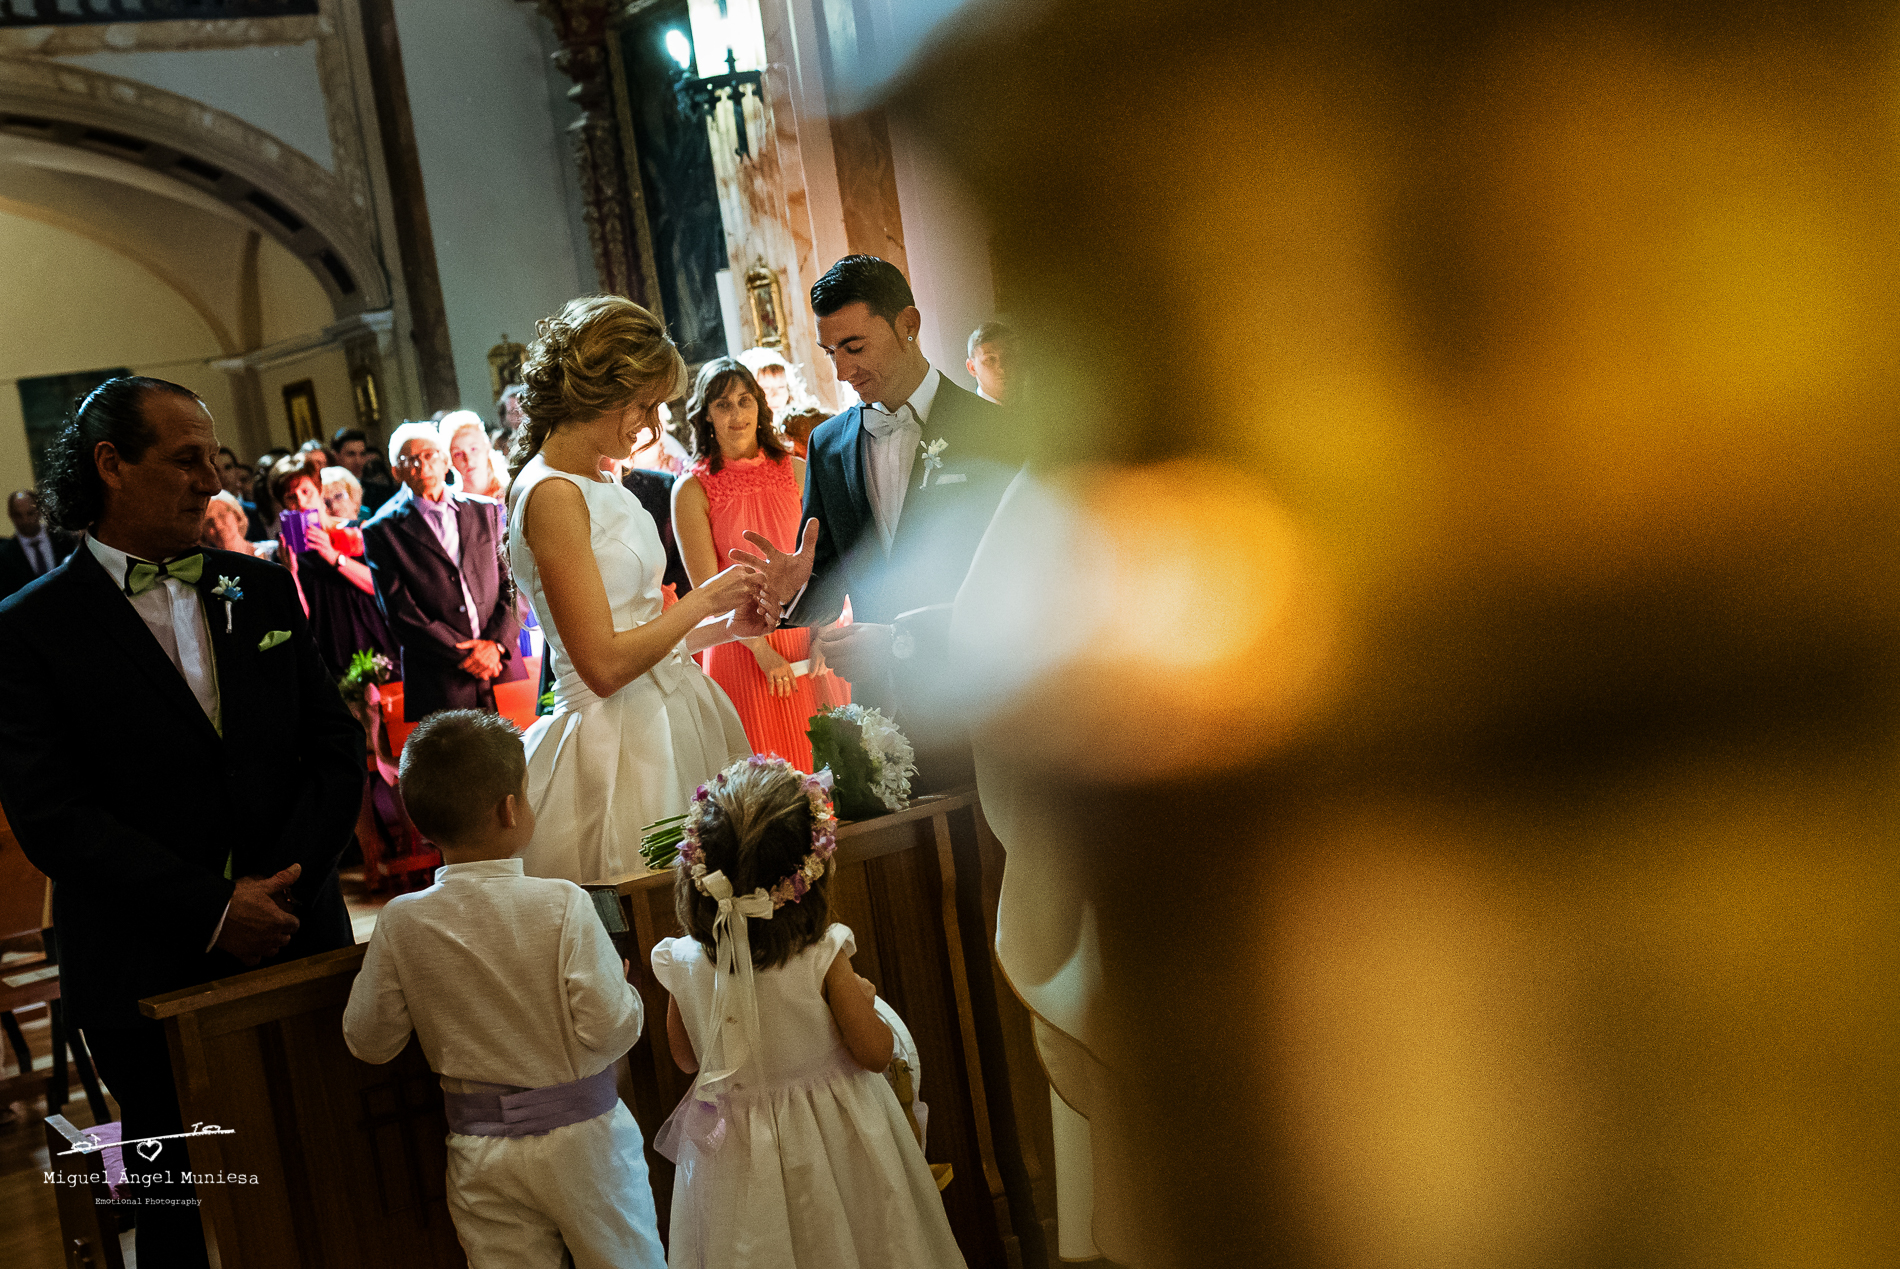 boda, fotografia de boda, boda zaragoza, fotografia, wedding, wedding photography, miguel angel muniesa, fotografo boda Zaragoza, fotografo boda, destination wedding_ 023